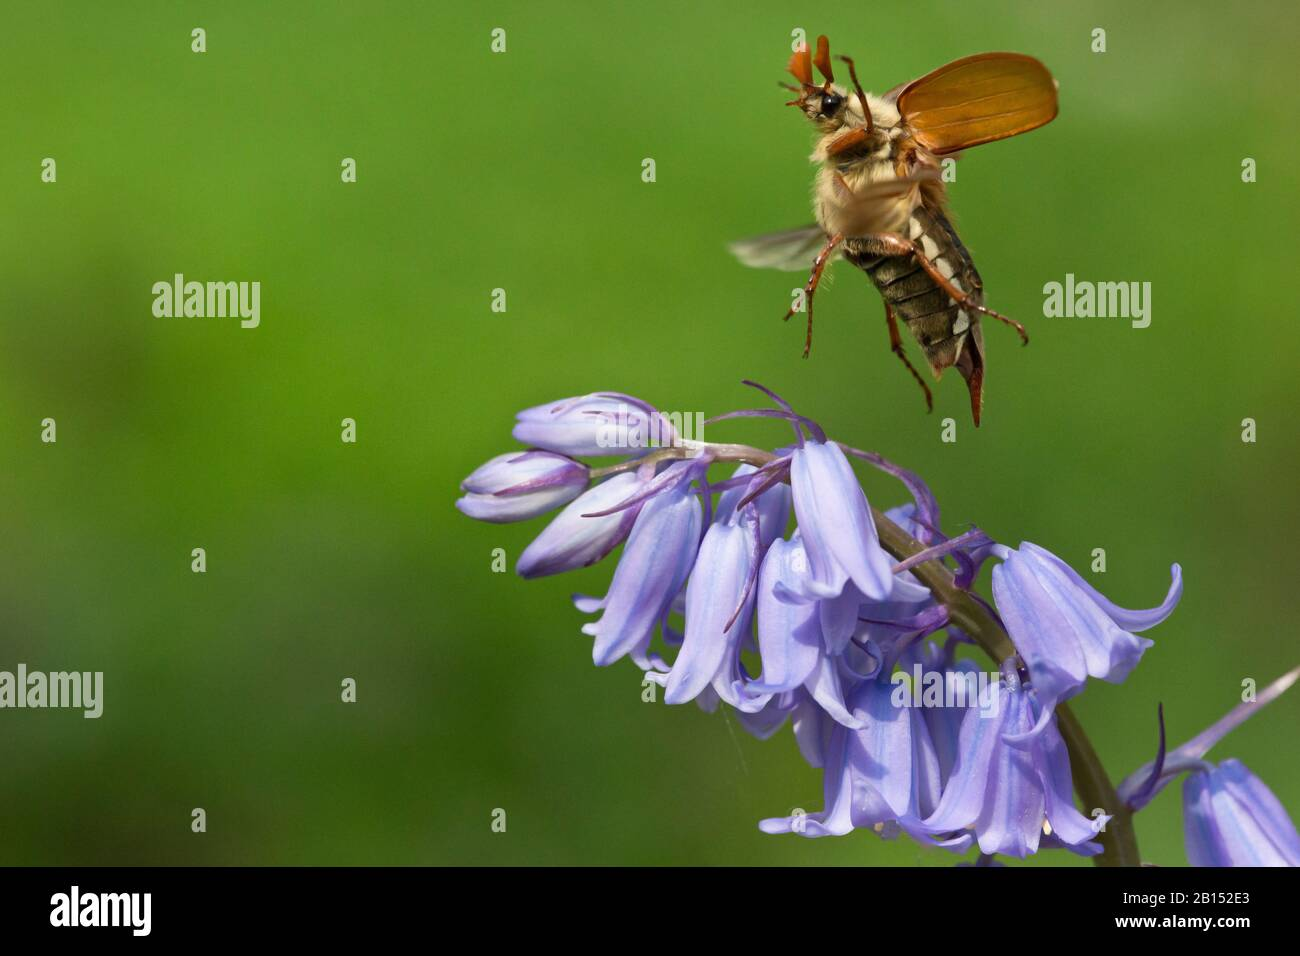 Cockchafer común, Maybug, Maybeetle (Melolontha melolontha), aterrizando en Bluebell, países Bajos Foto de stock